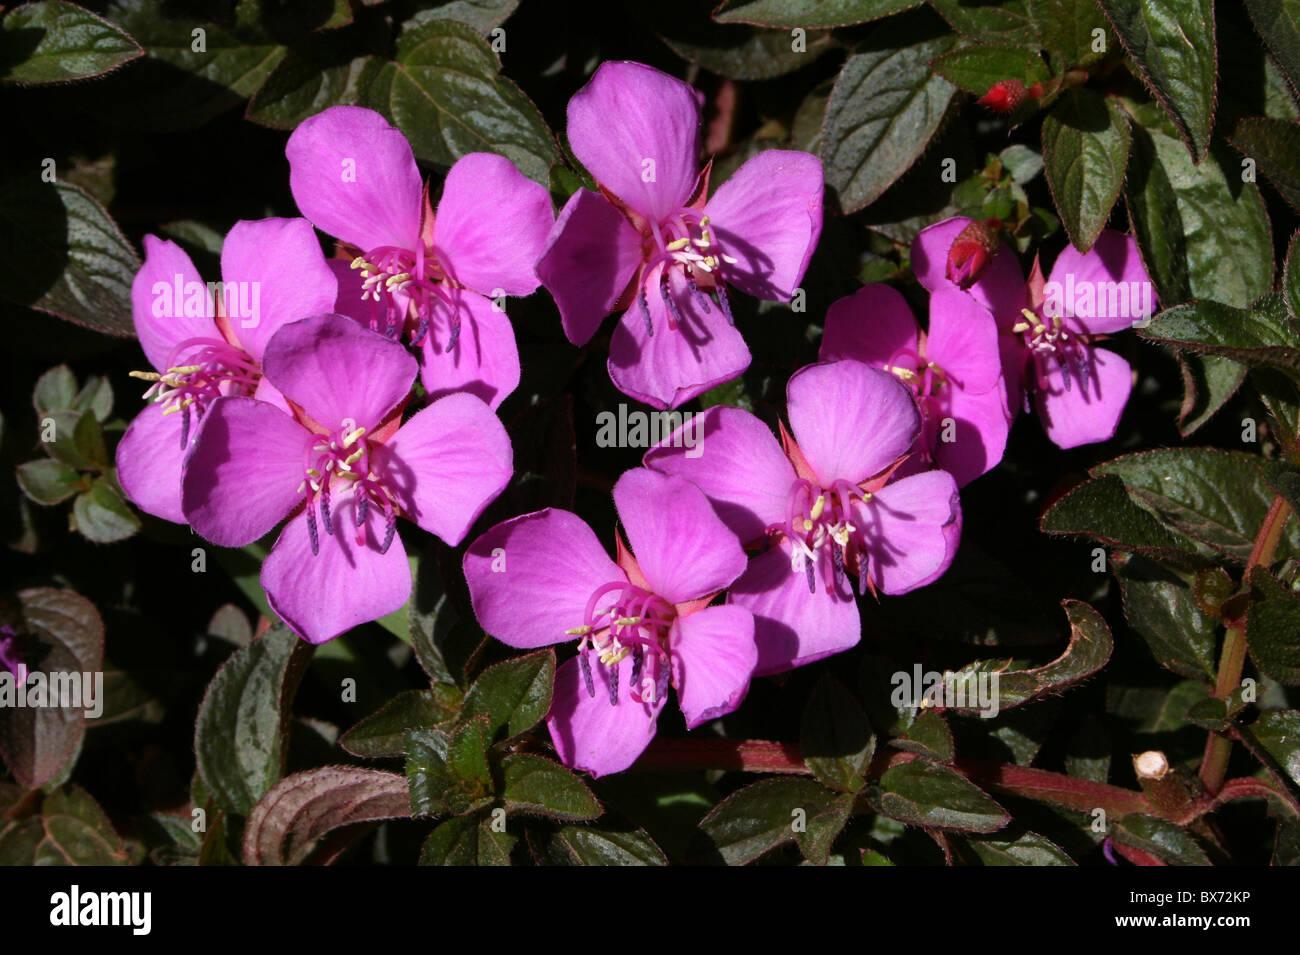 Shrub bush pink purple stock photos shrub bush pink purple stock pink purple flowering shrub spanish shawl heterocentron elegans taken in addis ababa ethiopia dhlflorist Choice Image